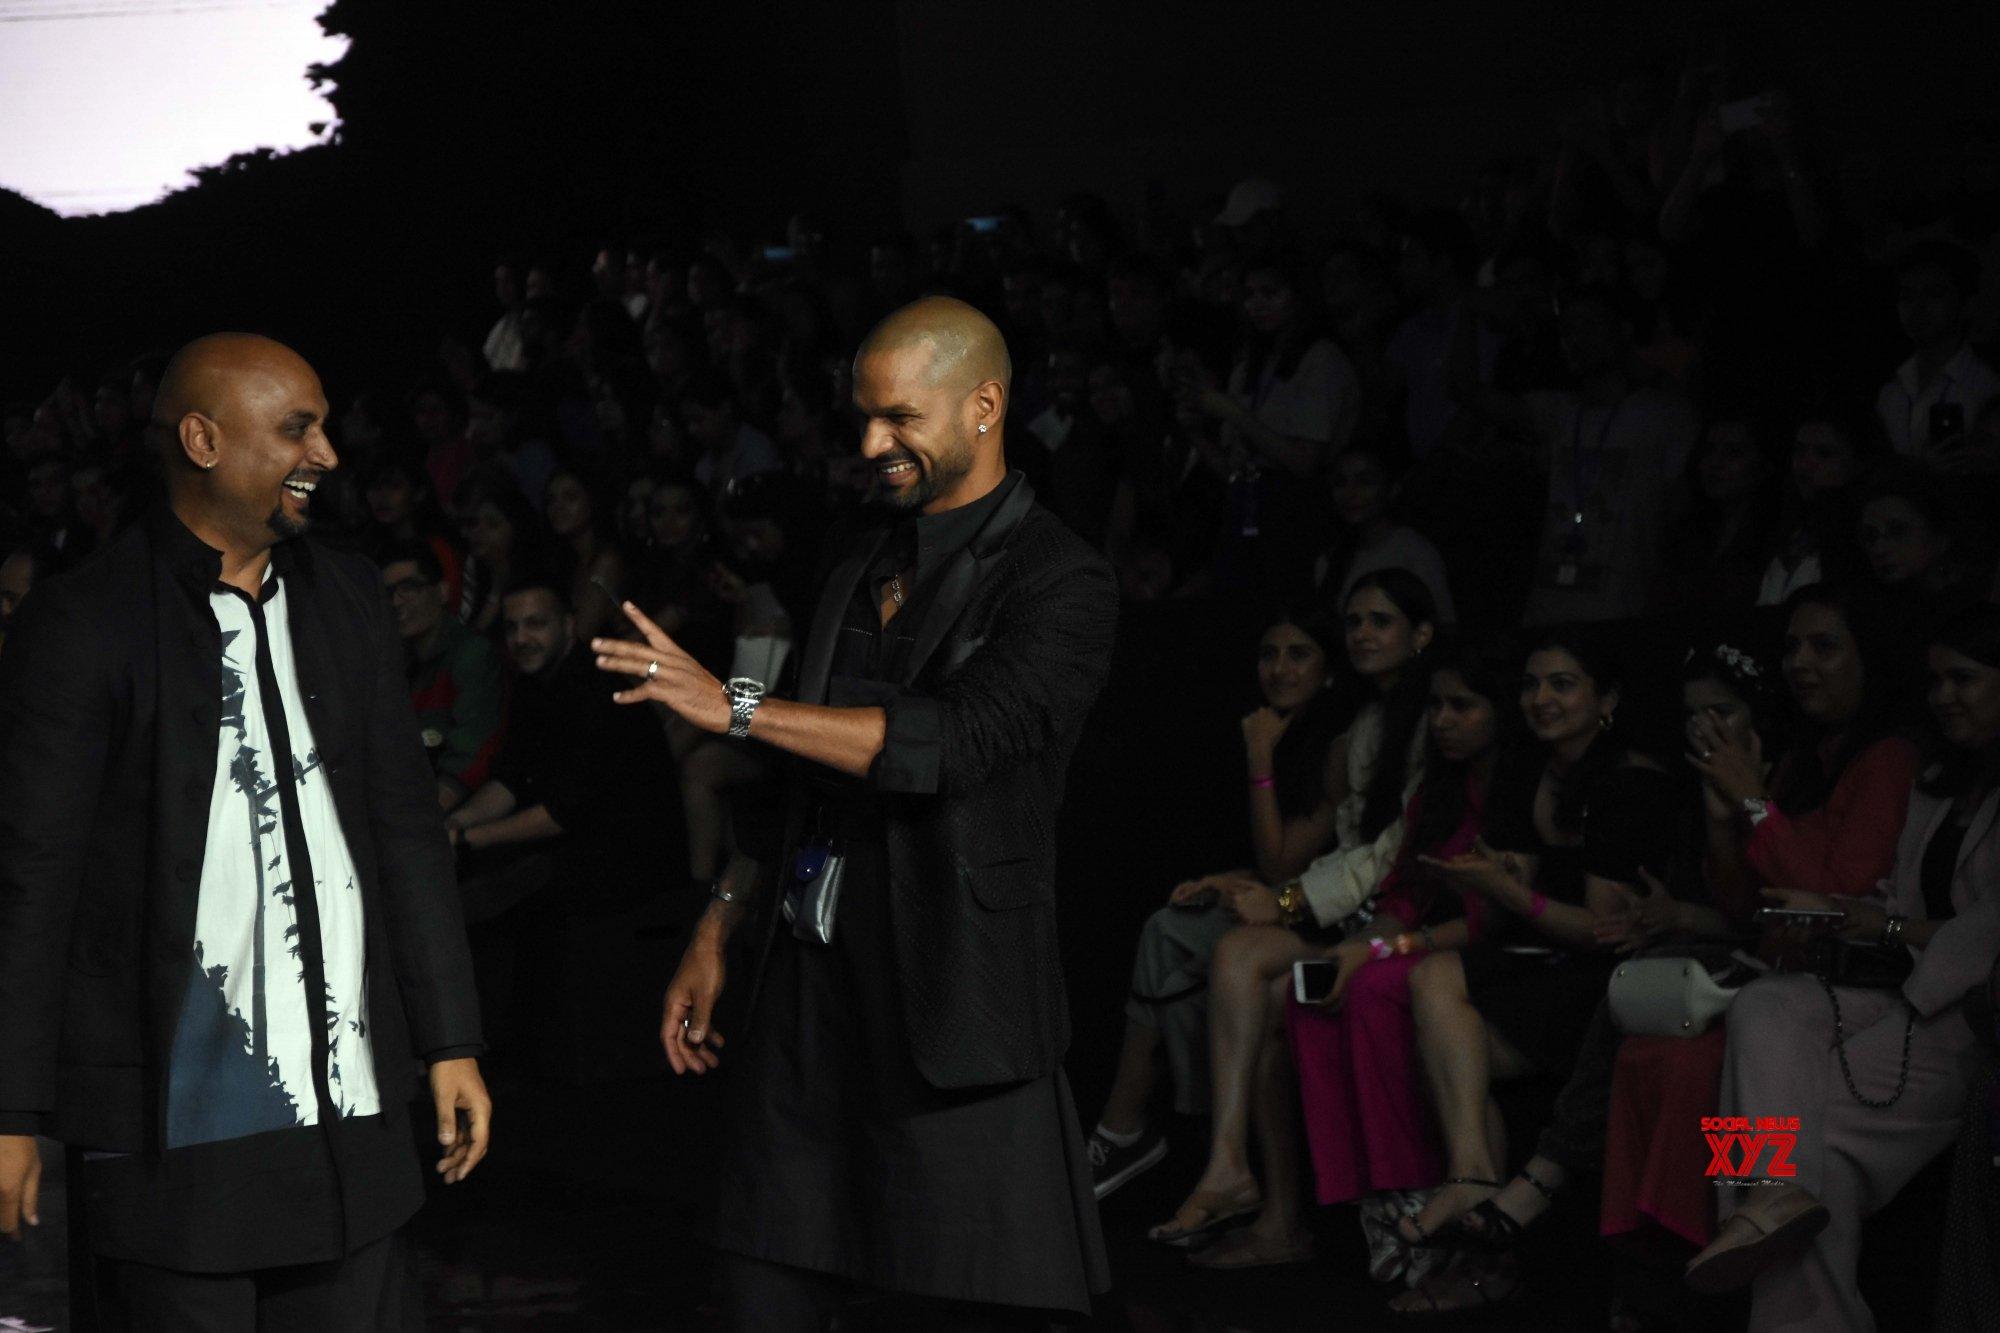 Mumbai: Shikhar Dhawan walks for Gaurang Shah at Lakme Fashion Week #Gallery